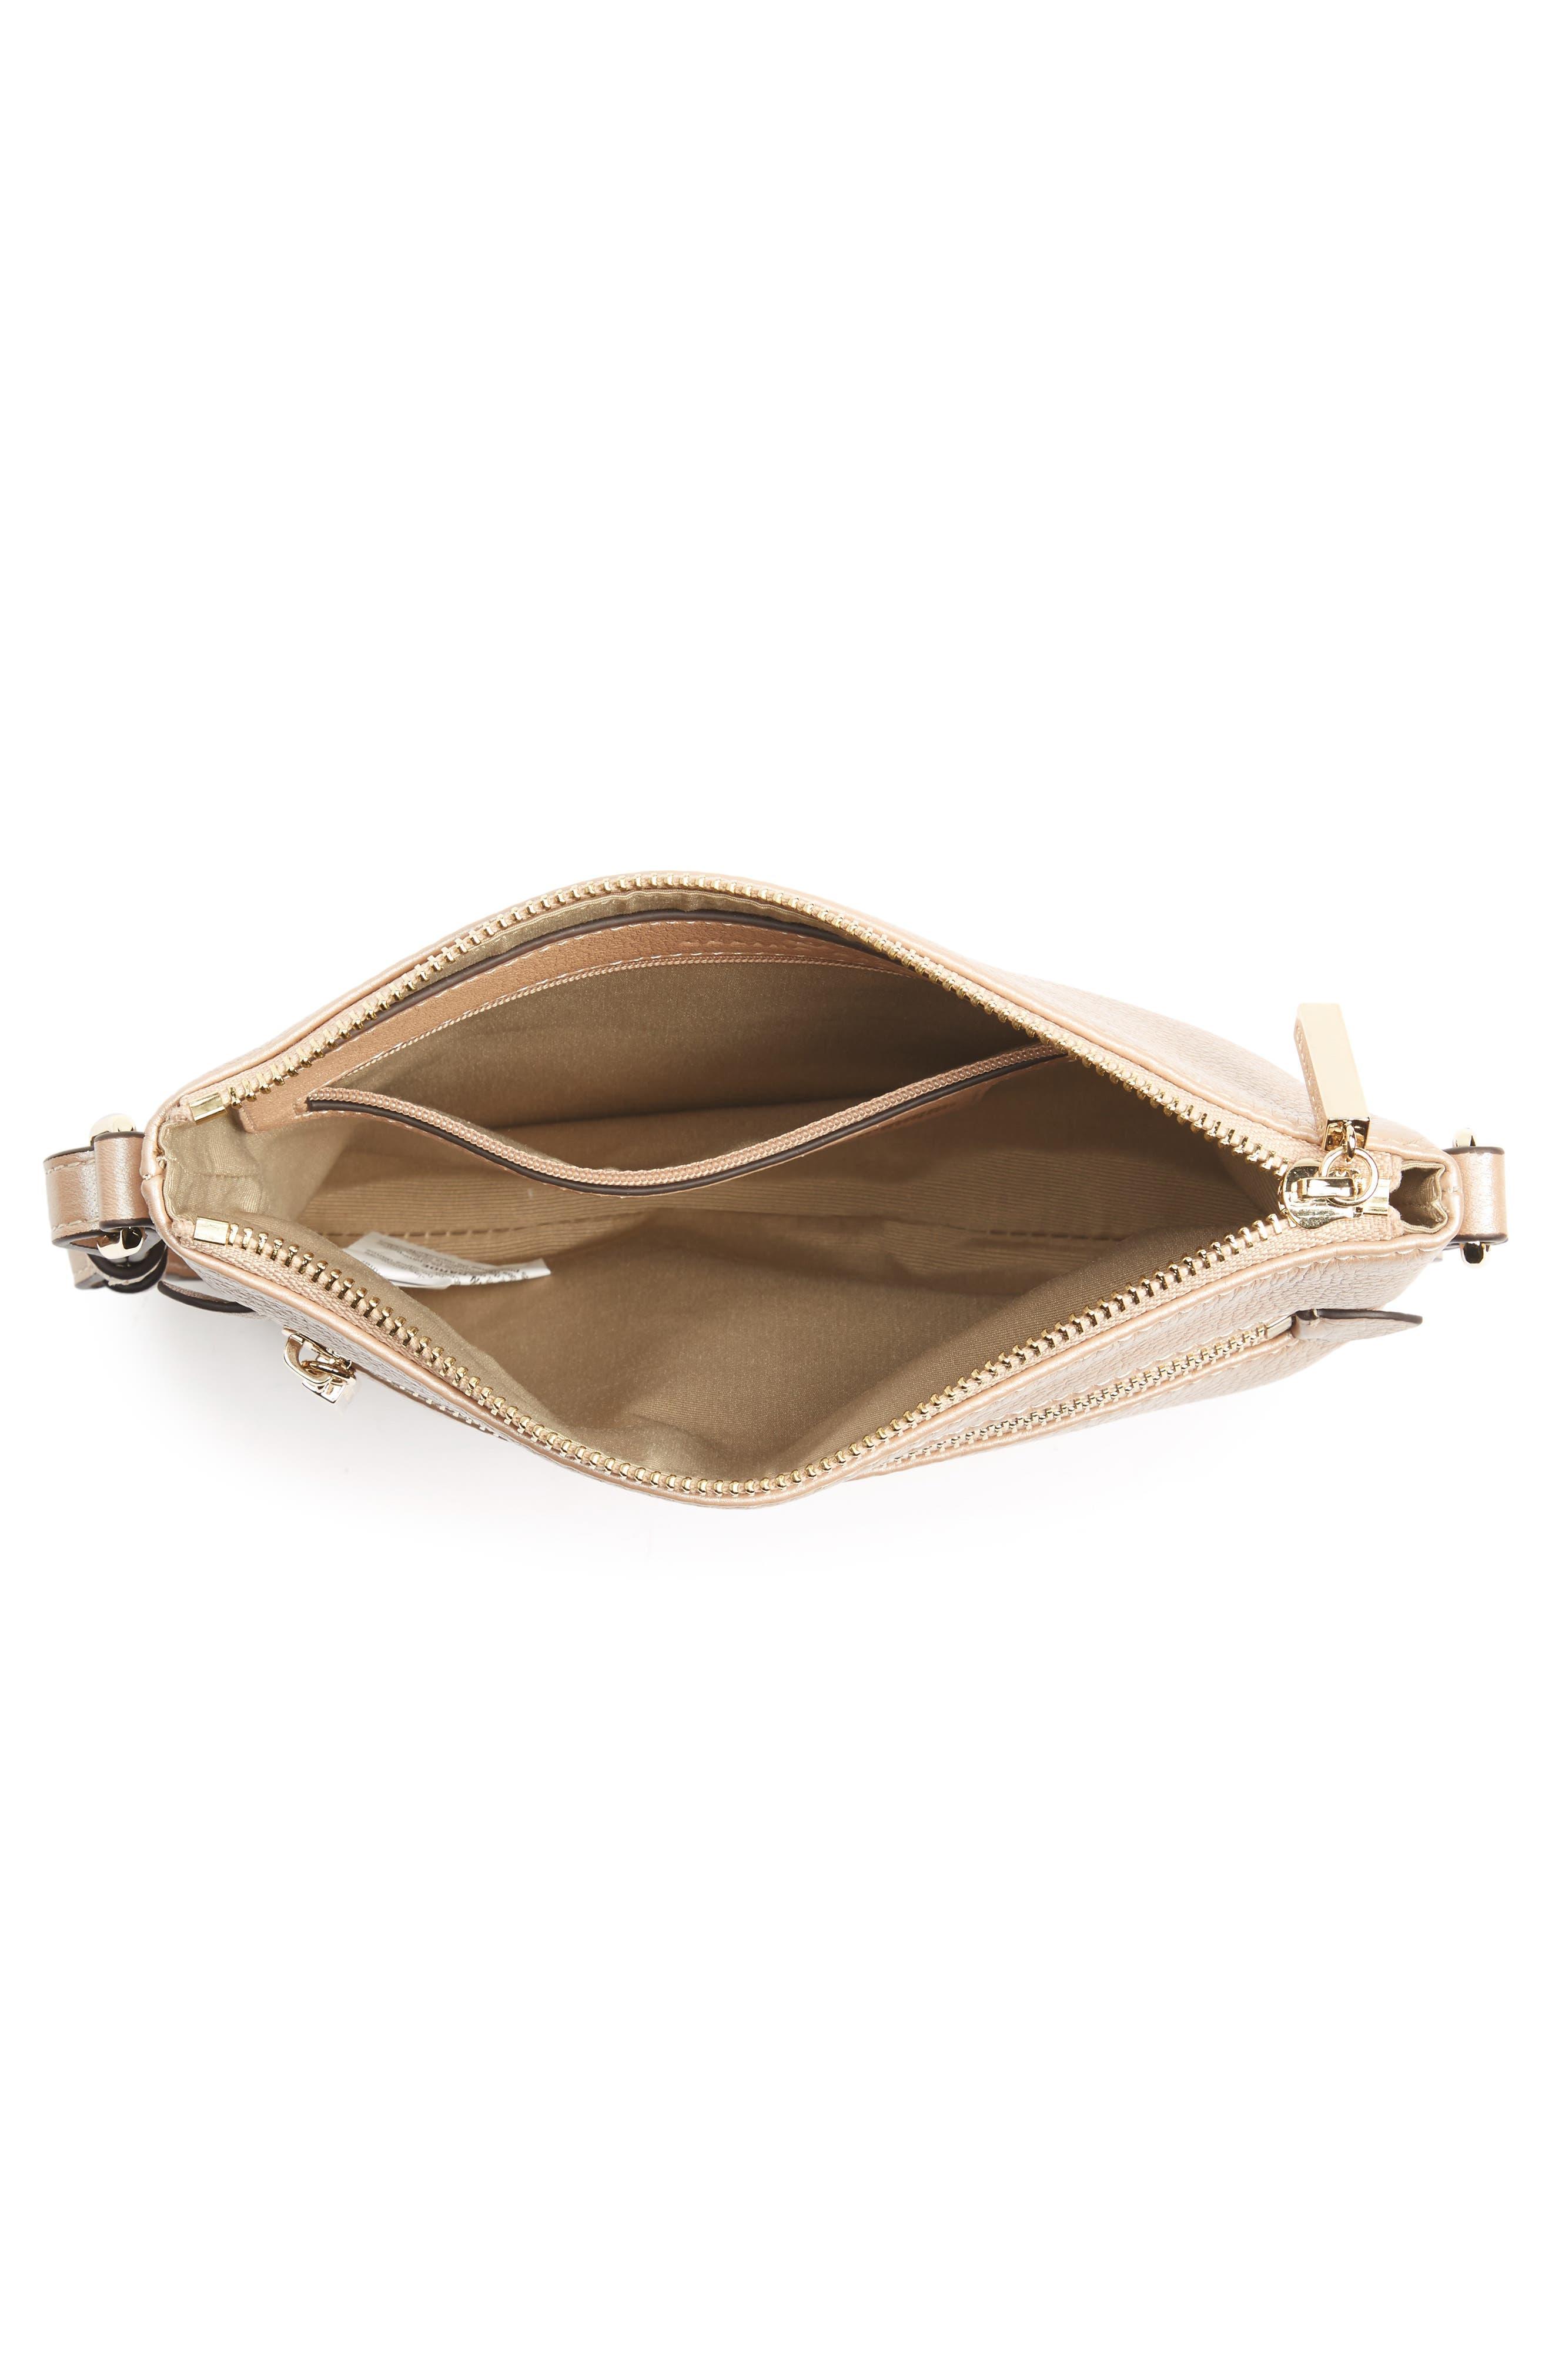 Céline Dion Adagio Leather Crossbody Bag,                             Alternate thumbnail 5, color,                             Rose Gold